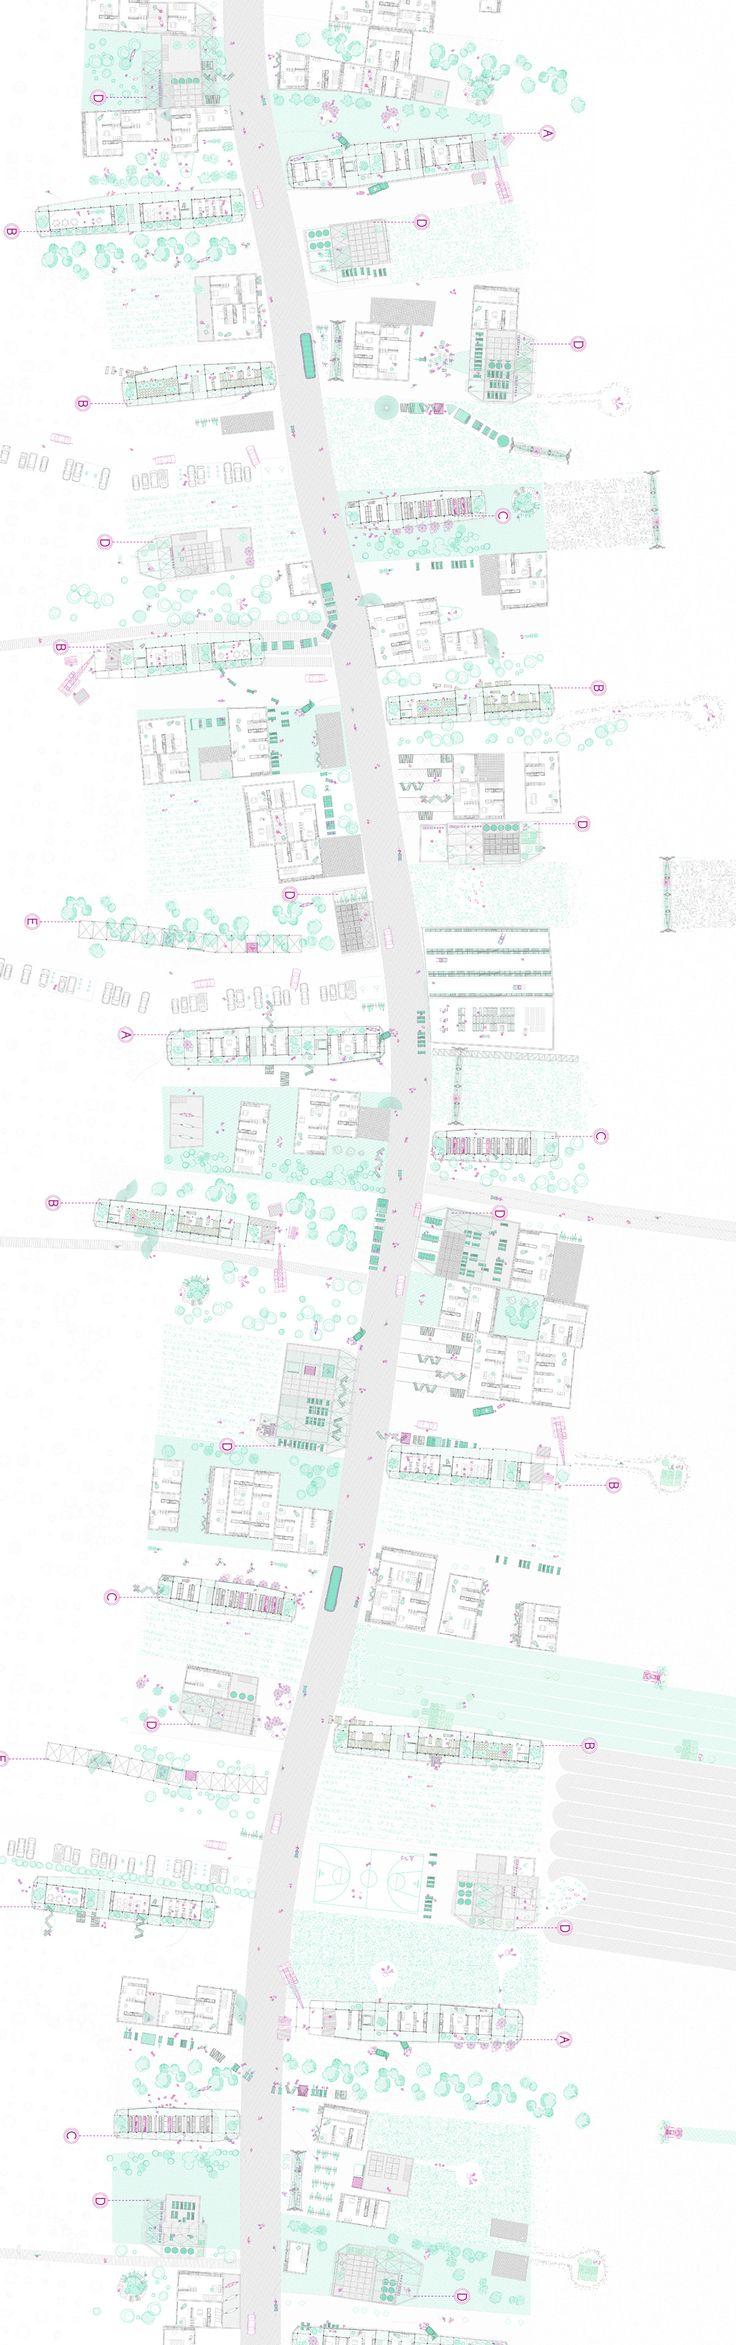 OPEN-END CITY  CAÑADA REAL GALIANA _Madrid  PFC ETSAM 2014 . . . . . . . . . . . . . . . Tutor: Luis Basabe Montalvo . . . . . . . . . . . . . . . Calificación: Notable  Open-end City engloba un conjunto de herramientas de código abierto para la...